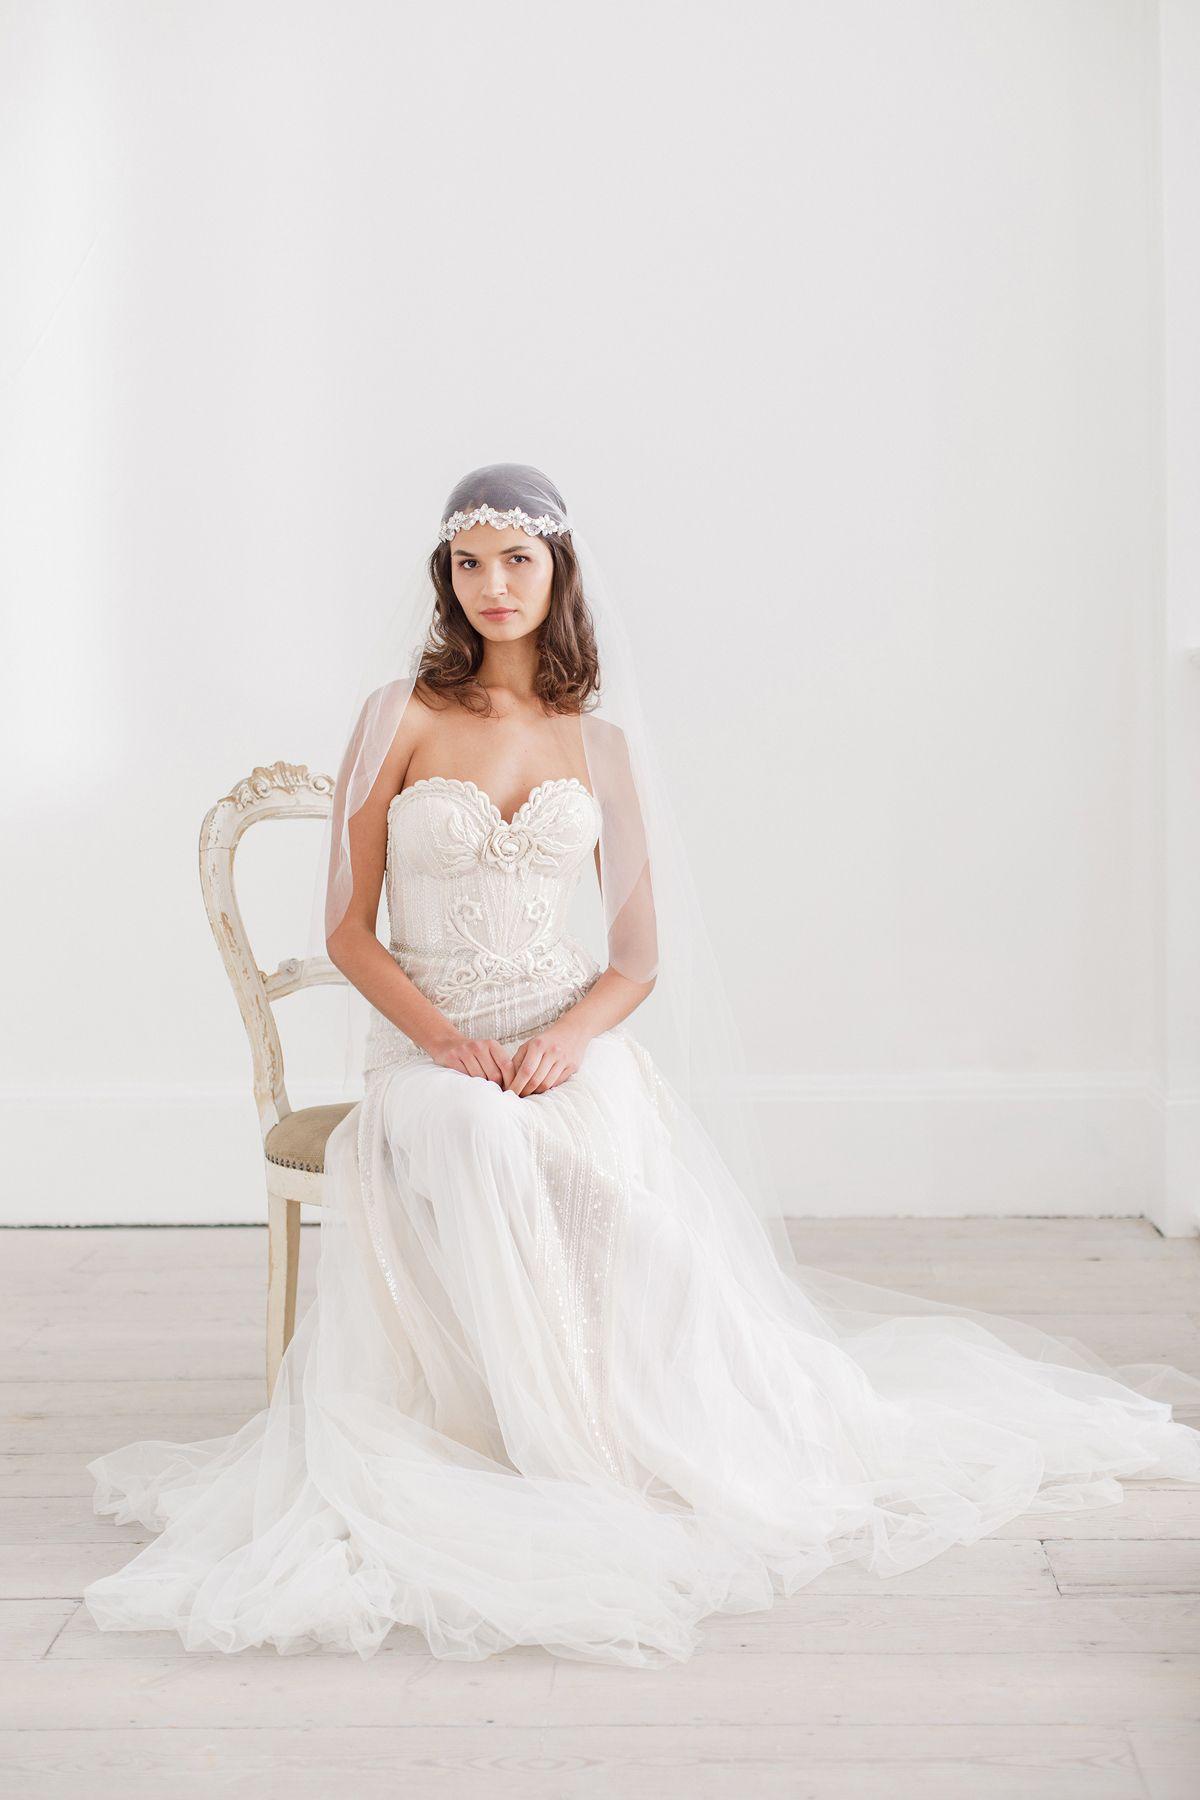 Britten Wedding Veils The Most Popular Wedding Veils for